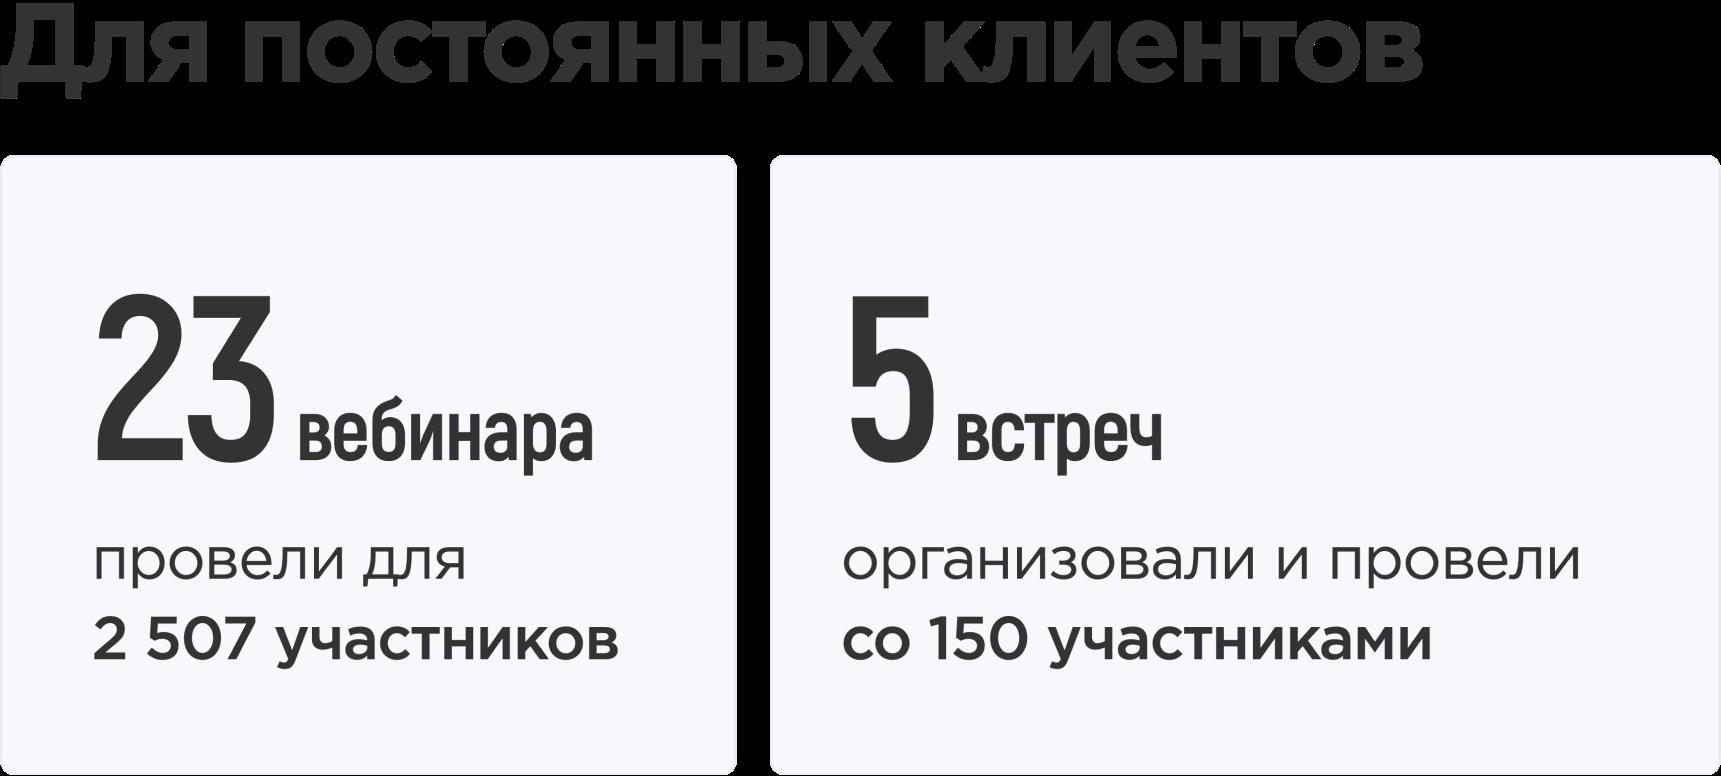 image 3.png